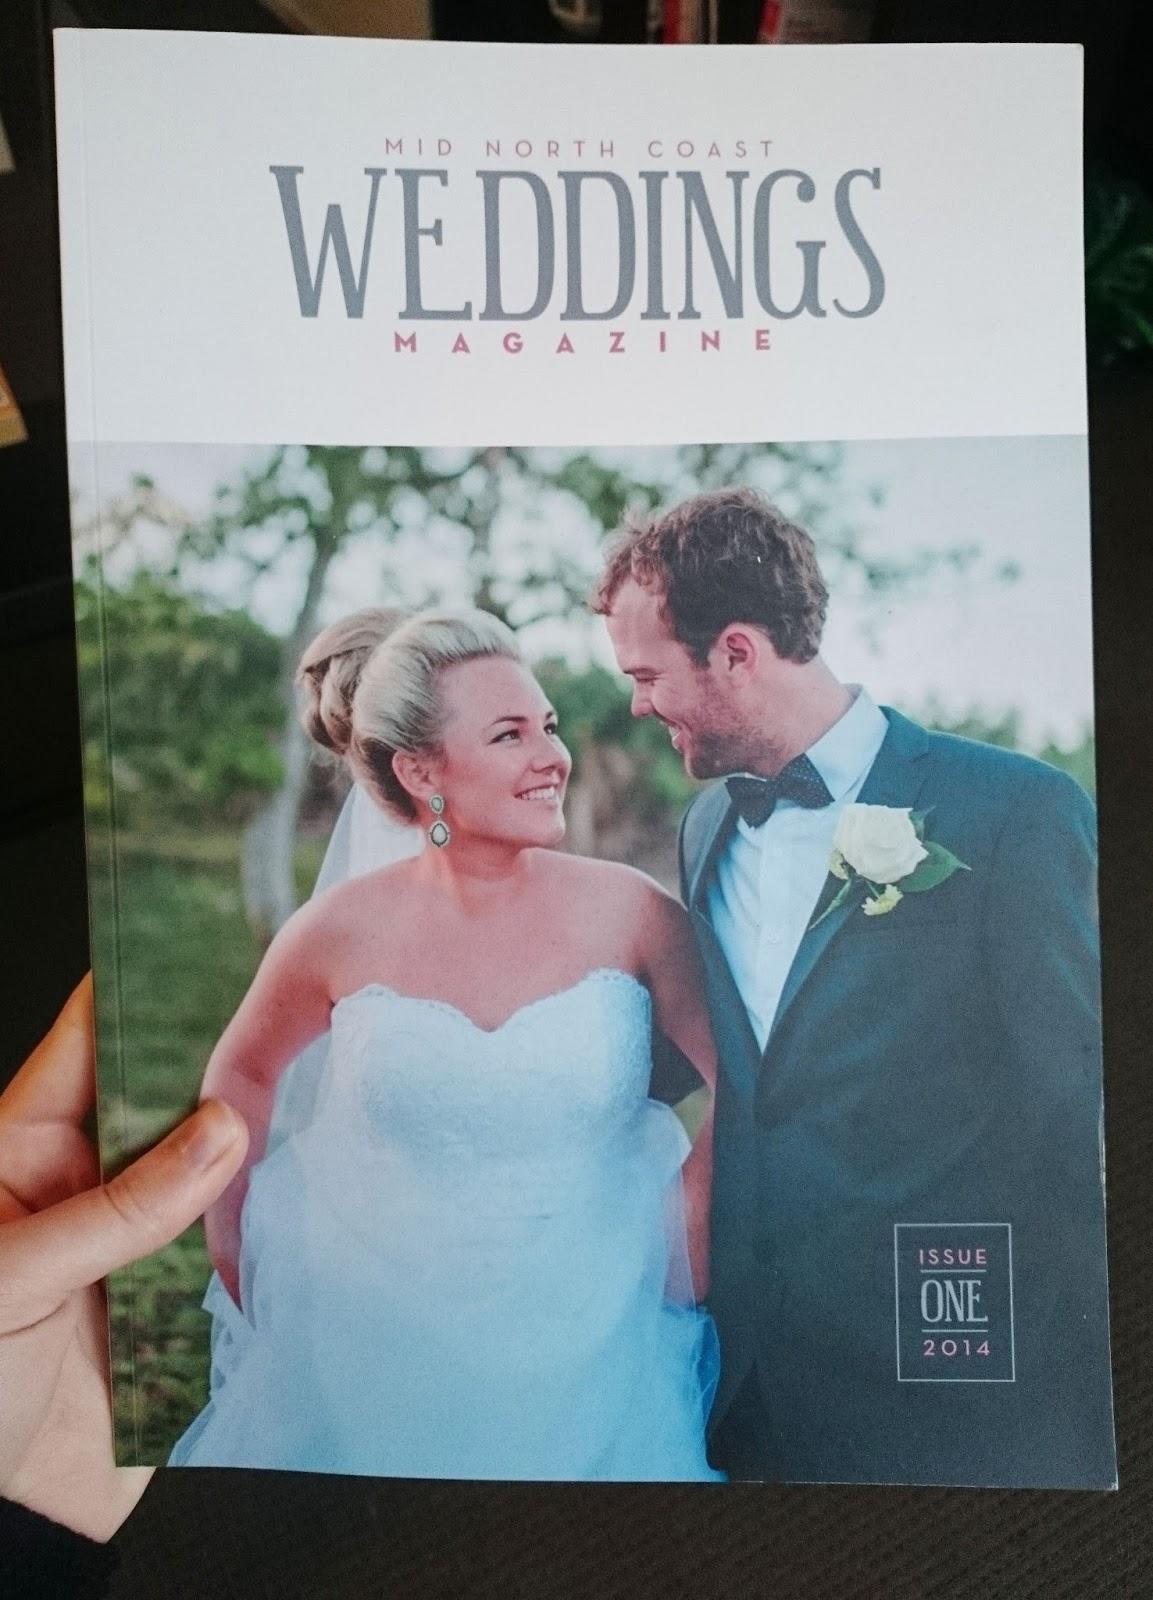 Mid North Coast Weddings Magazine Sail And Swan Wedding Invitations Rustic Vintage Hand Drawn Lettering